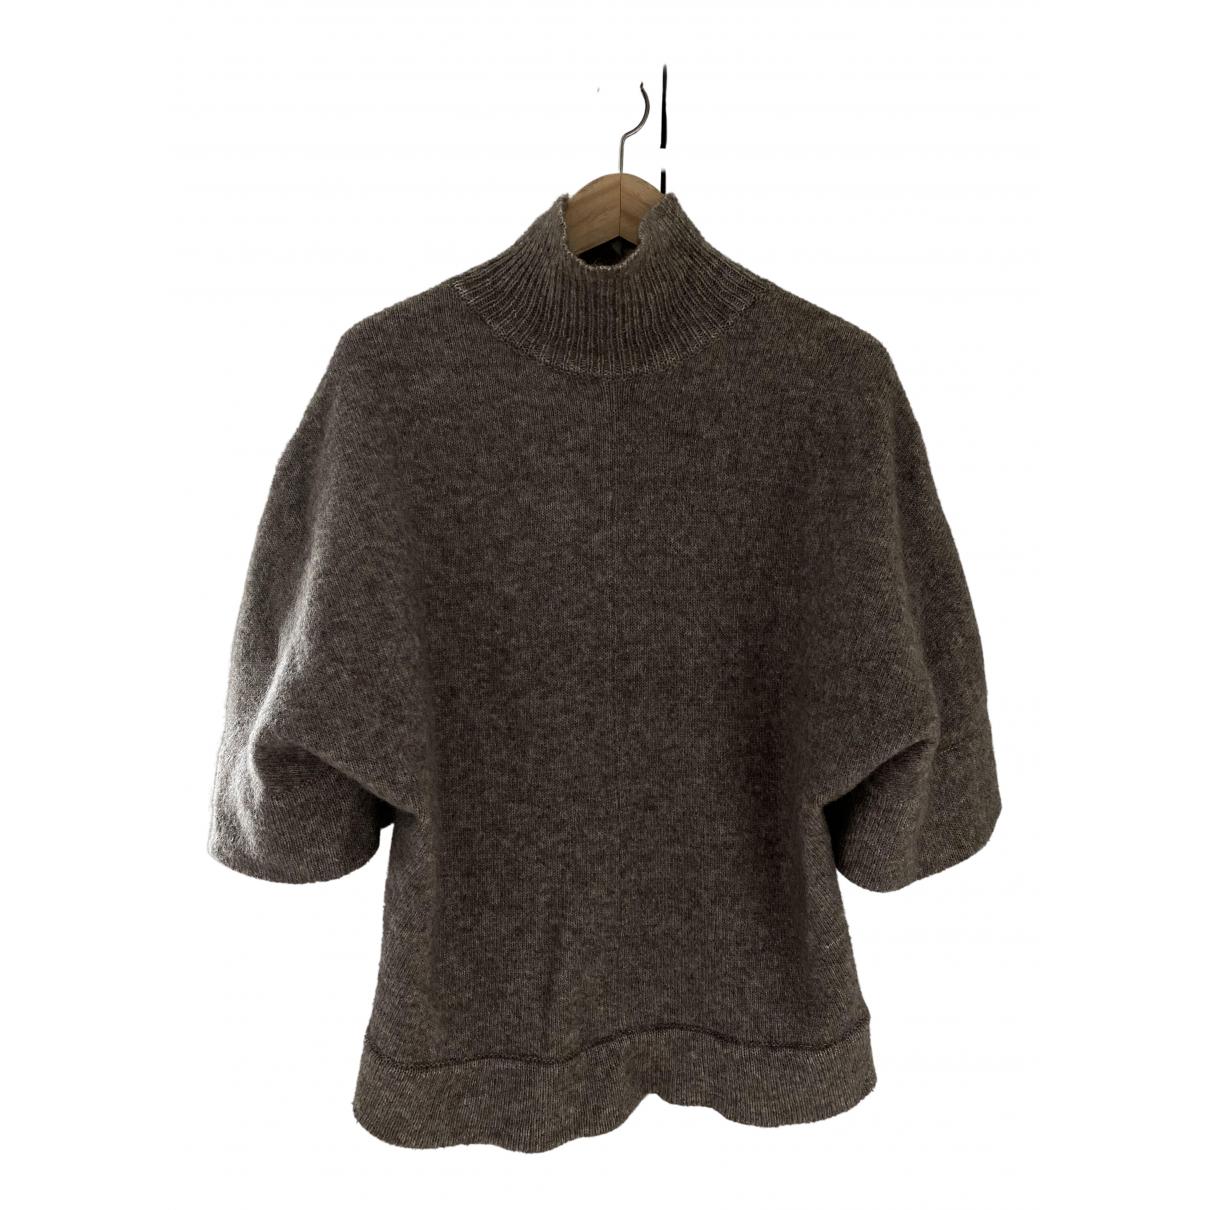 Stella Mccartney - Pull   pour femme en laine - beige